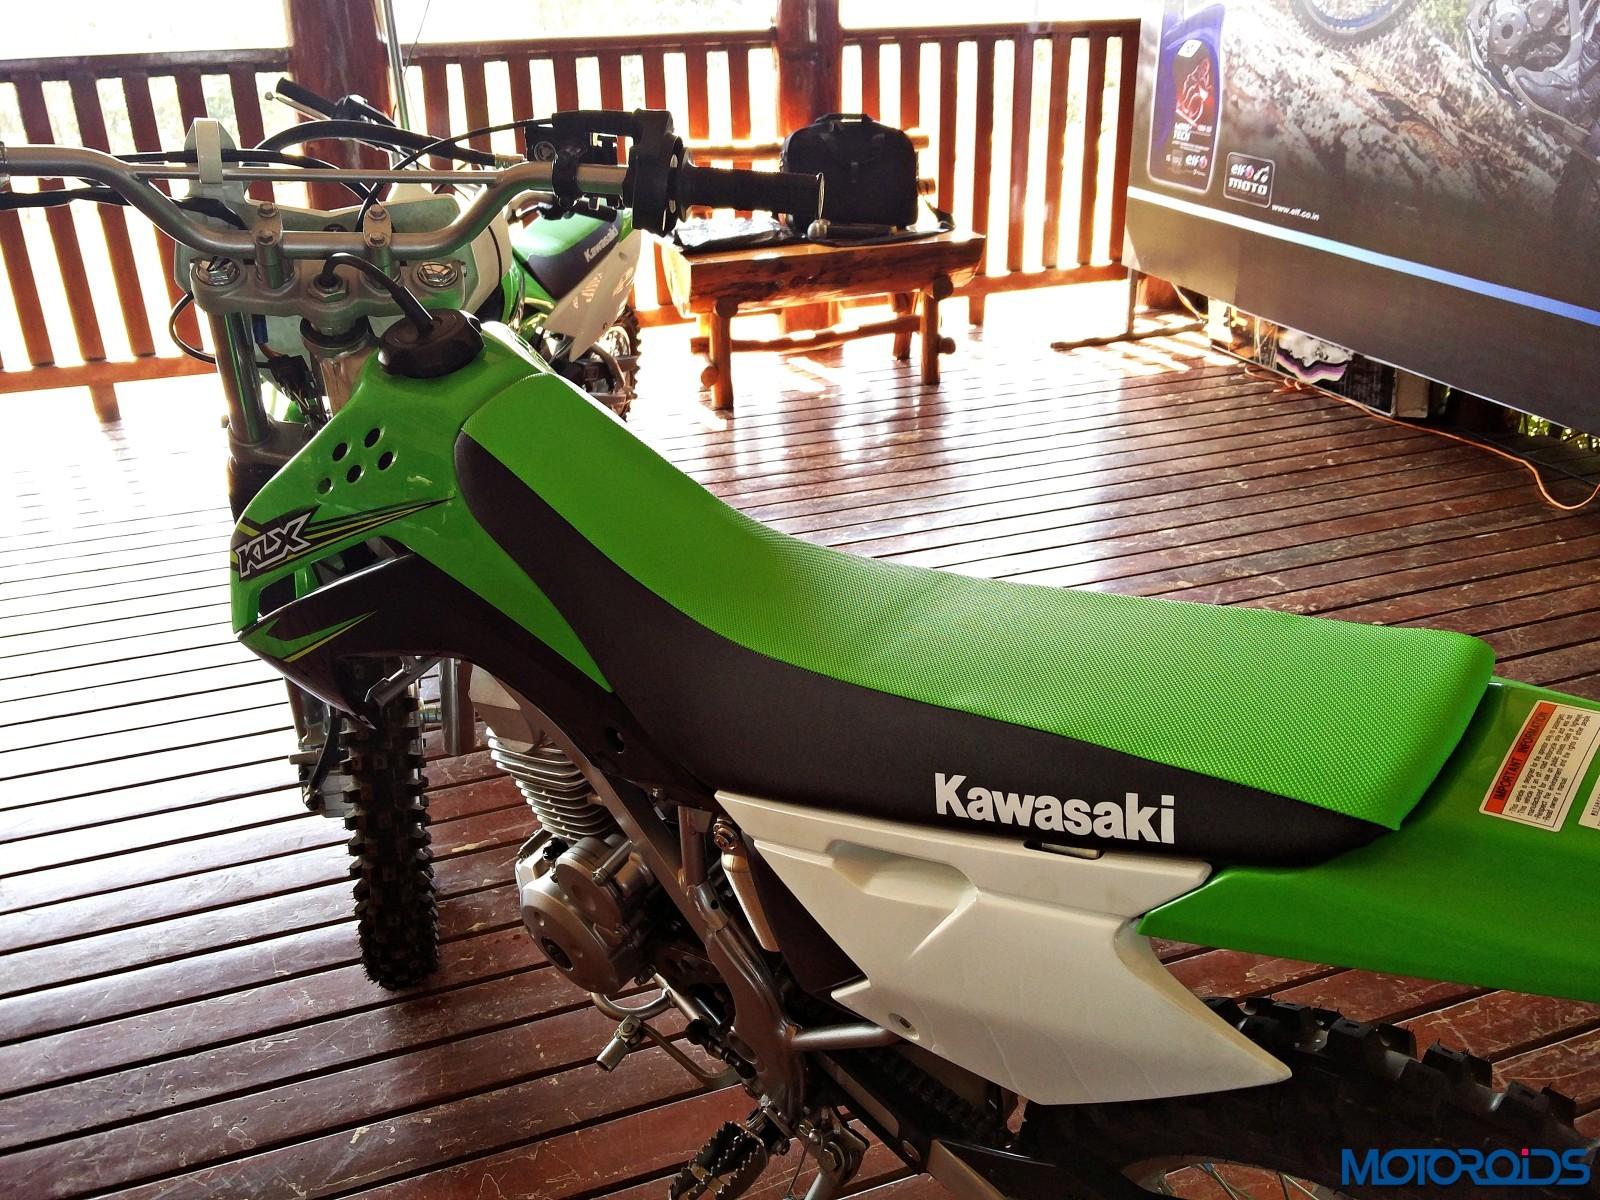 Kawasaki-KLX140G-Ride-Experience-13